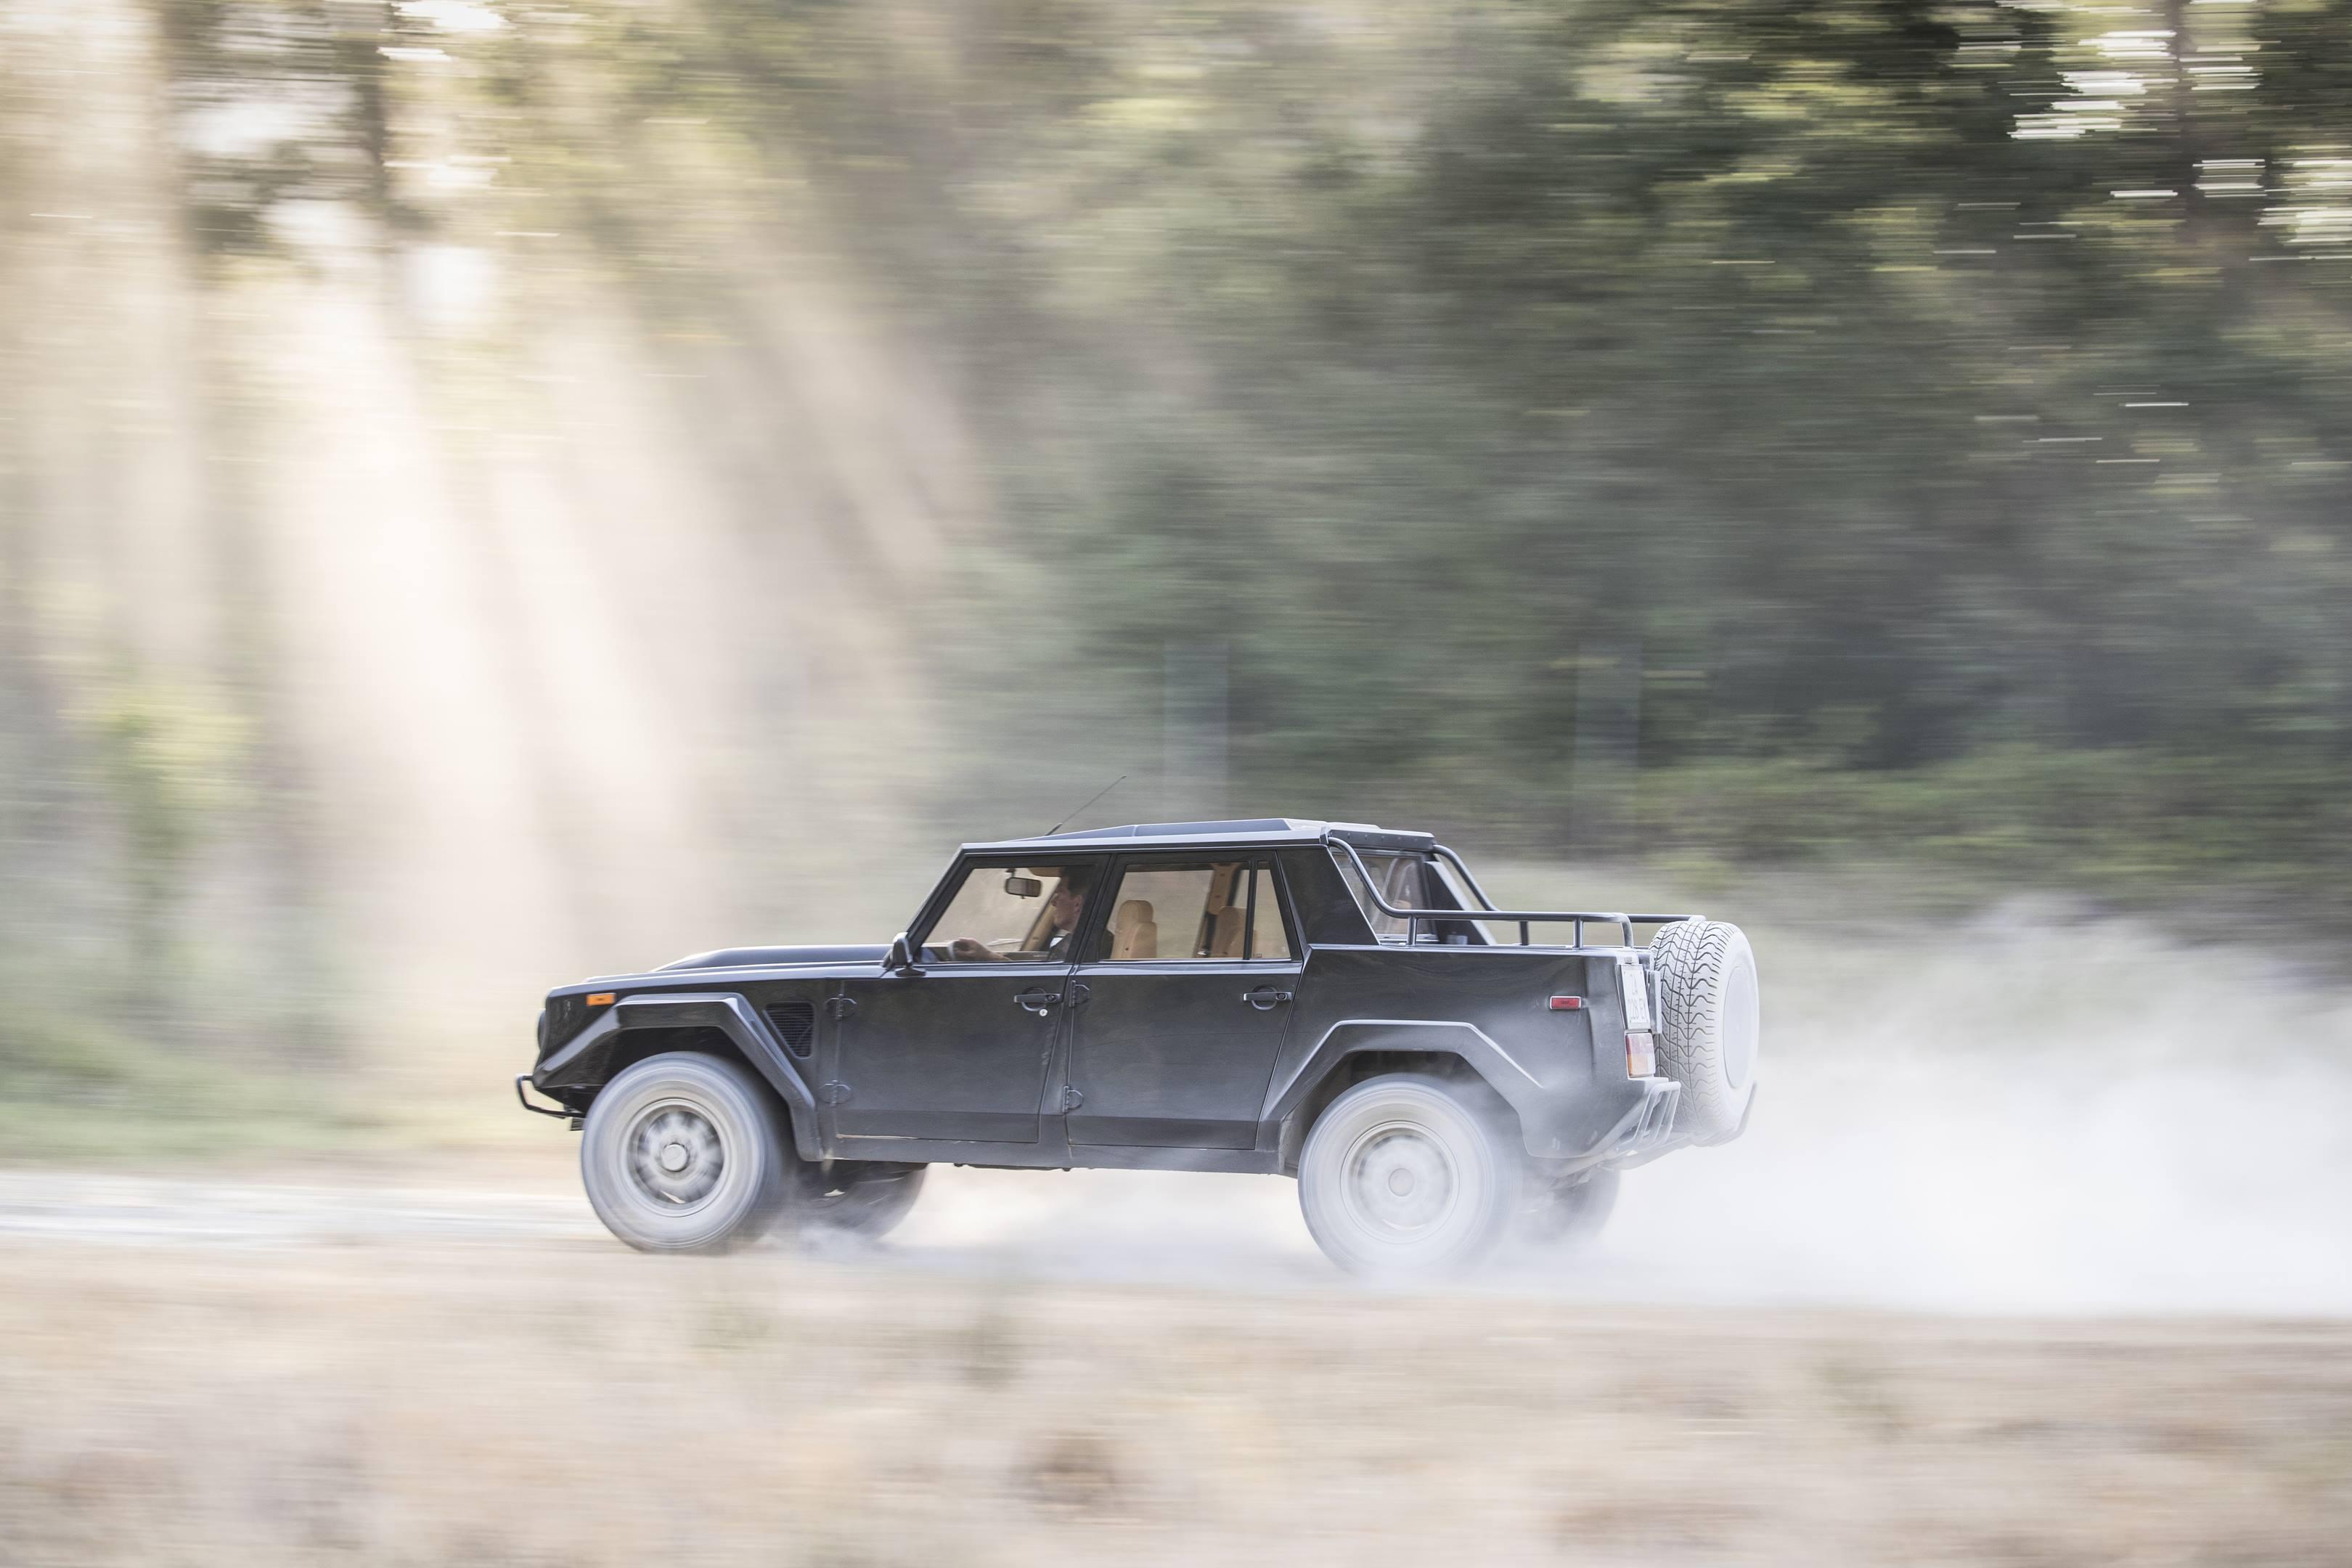 Lamborghini LM002 off roading